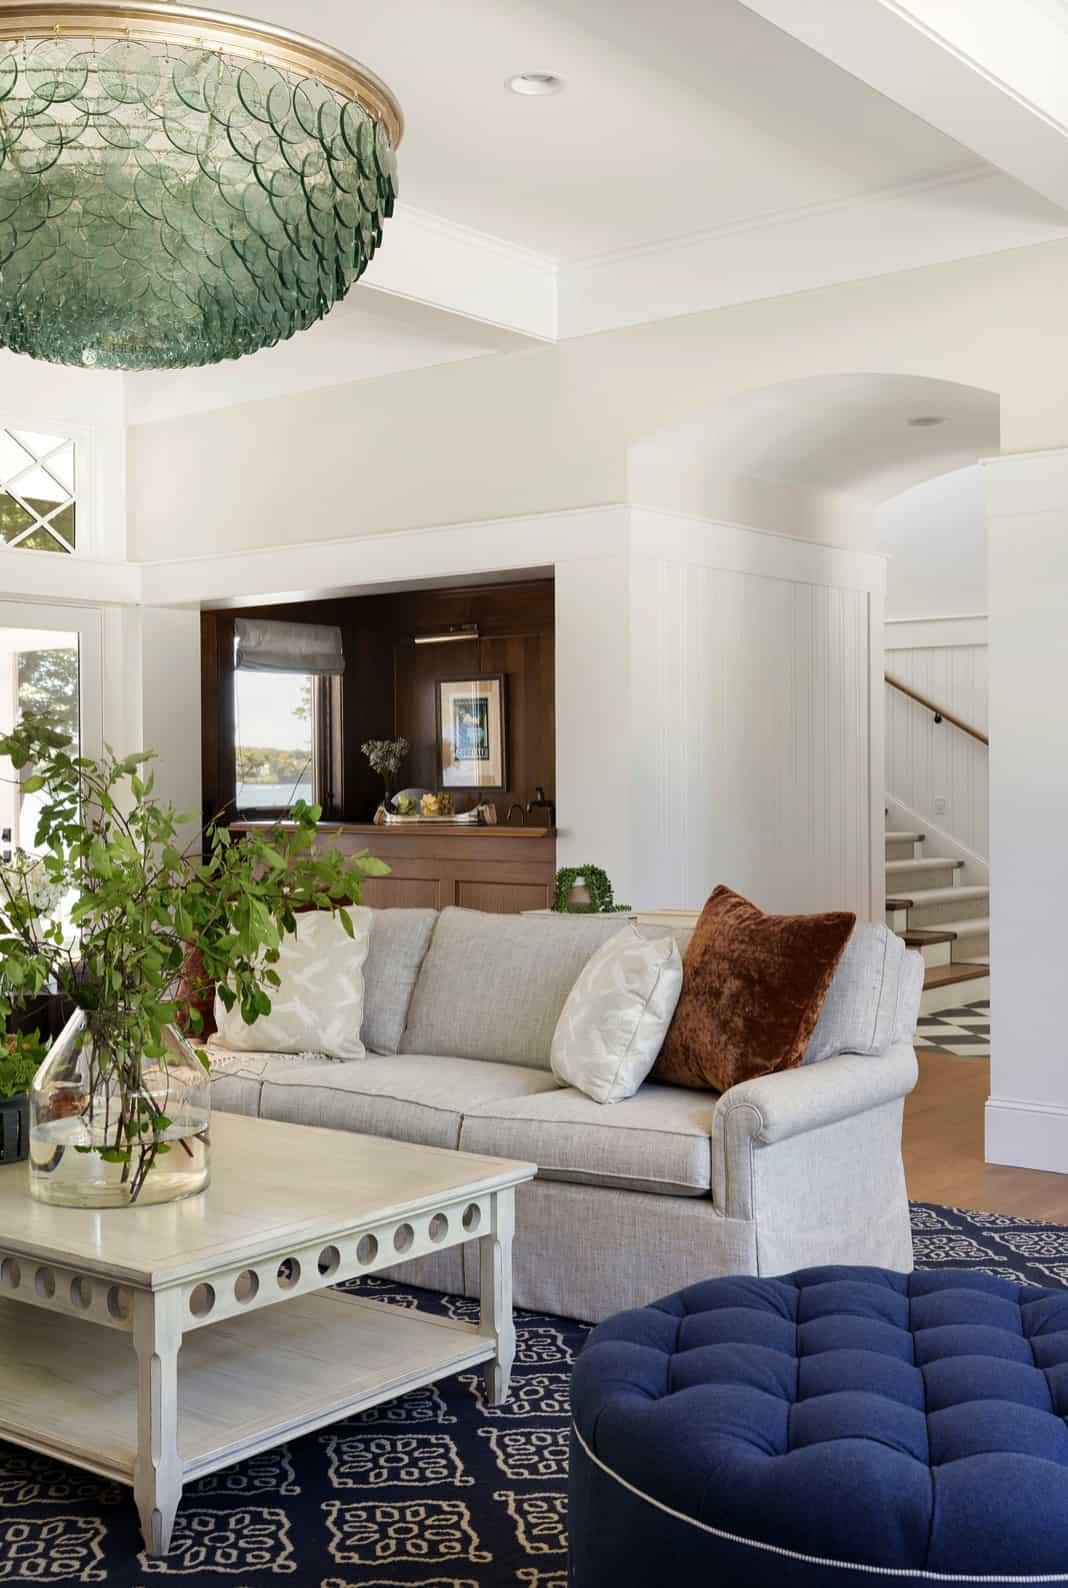 dnevna soba u stilu obalne plaže